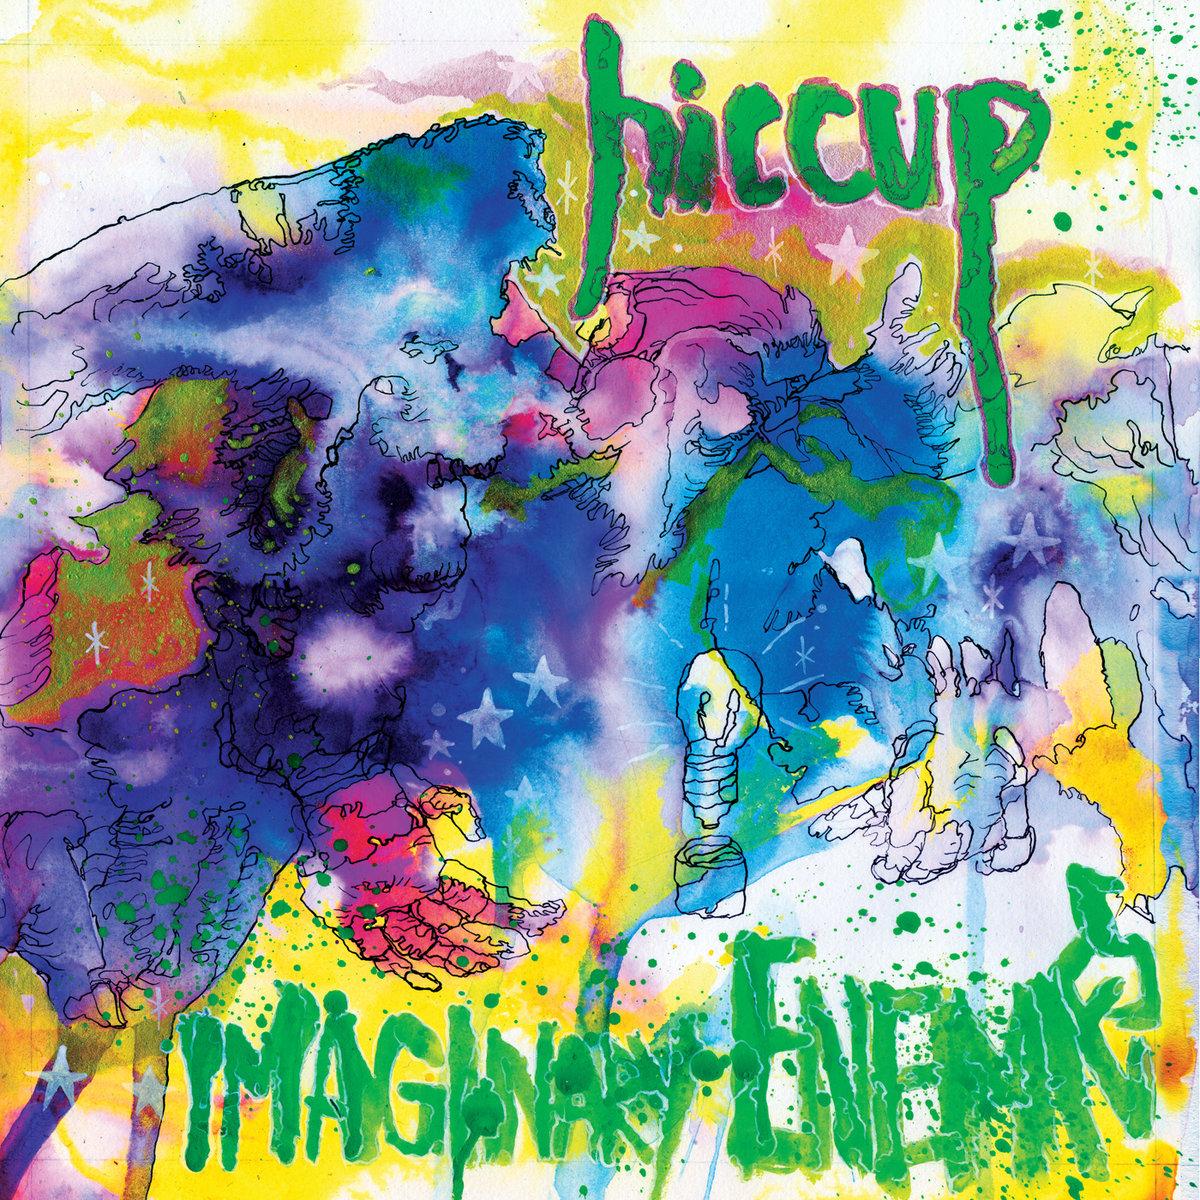 Hiccup - Imaginary Enemies LP